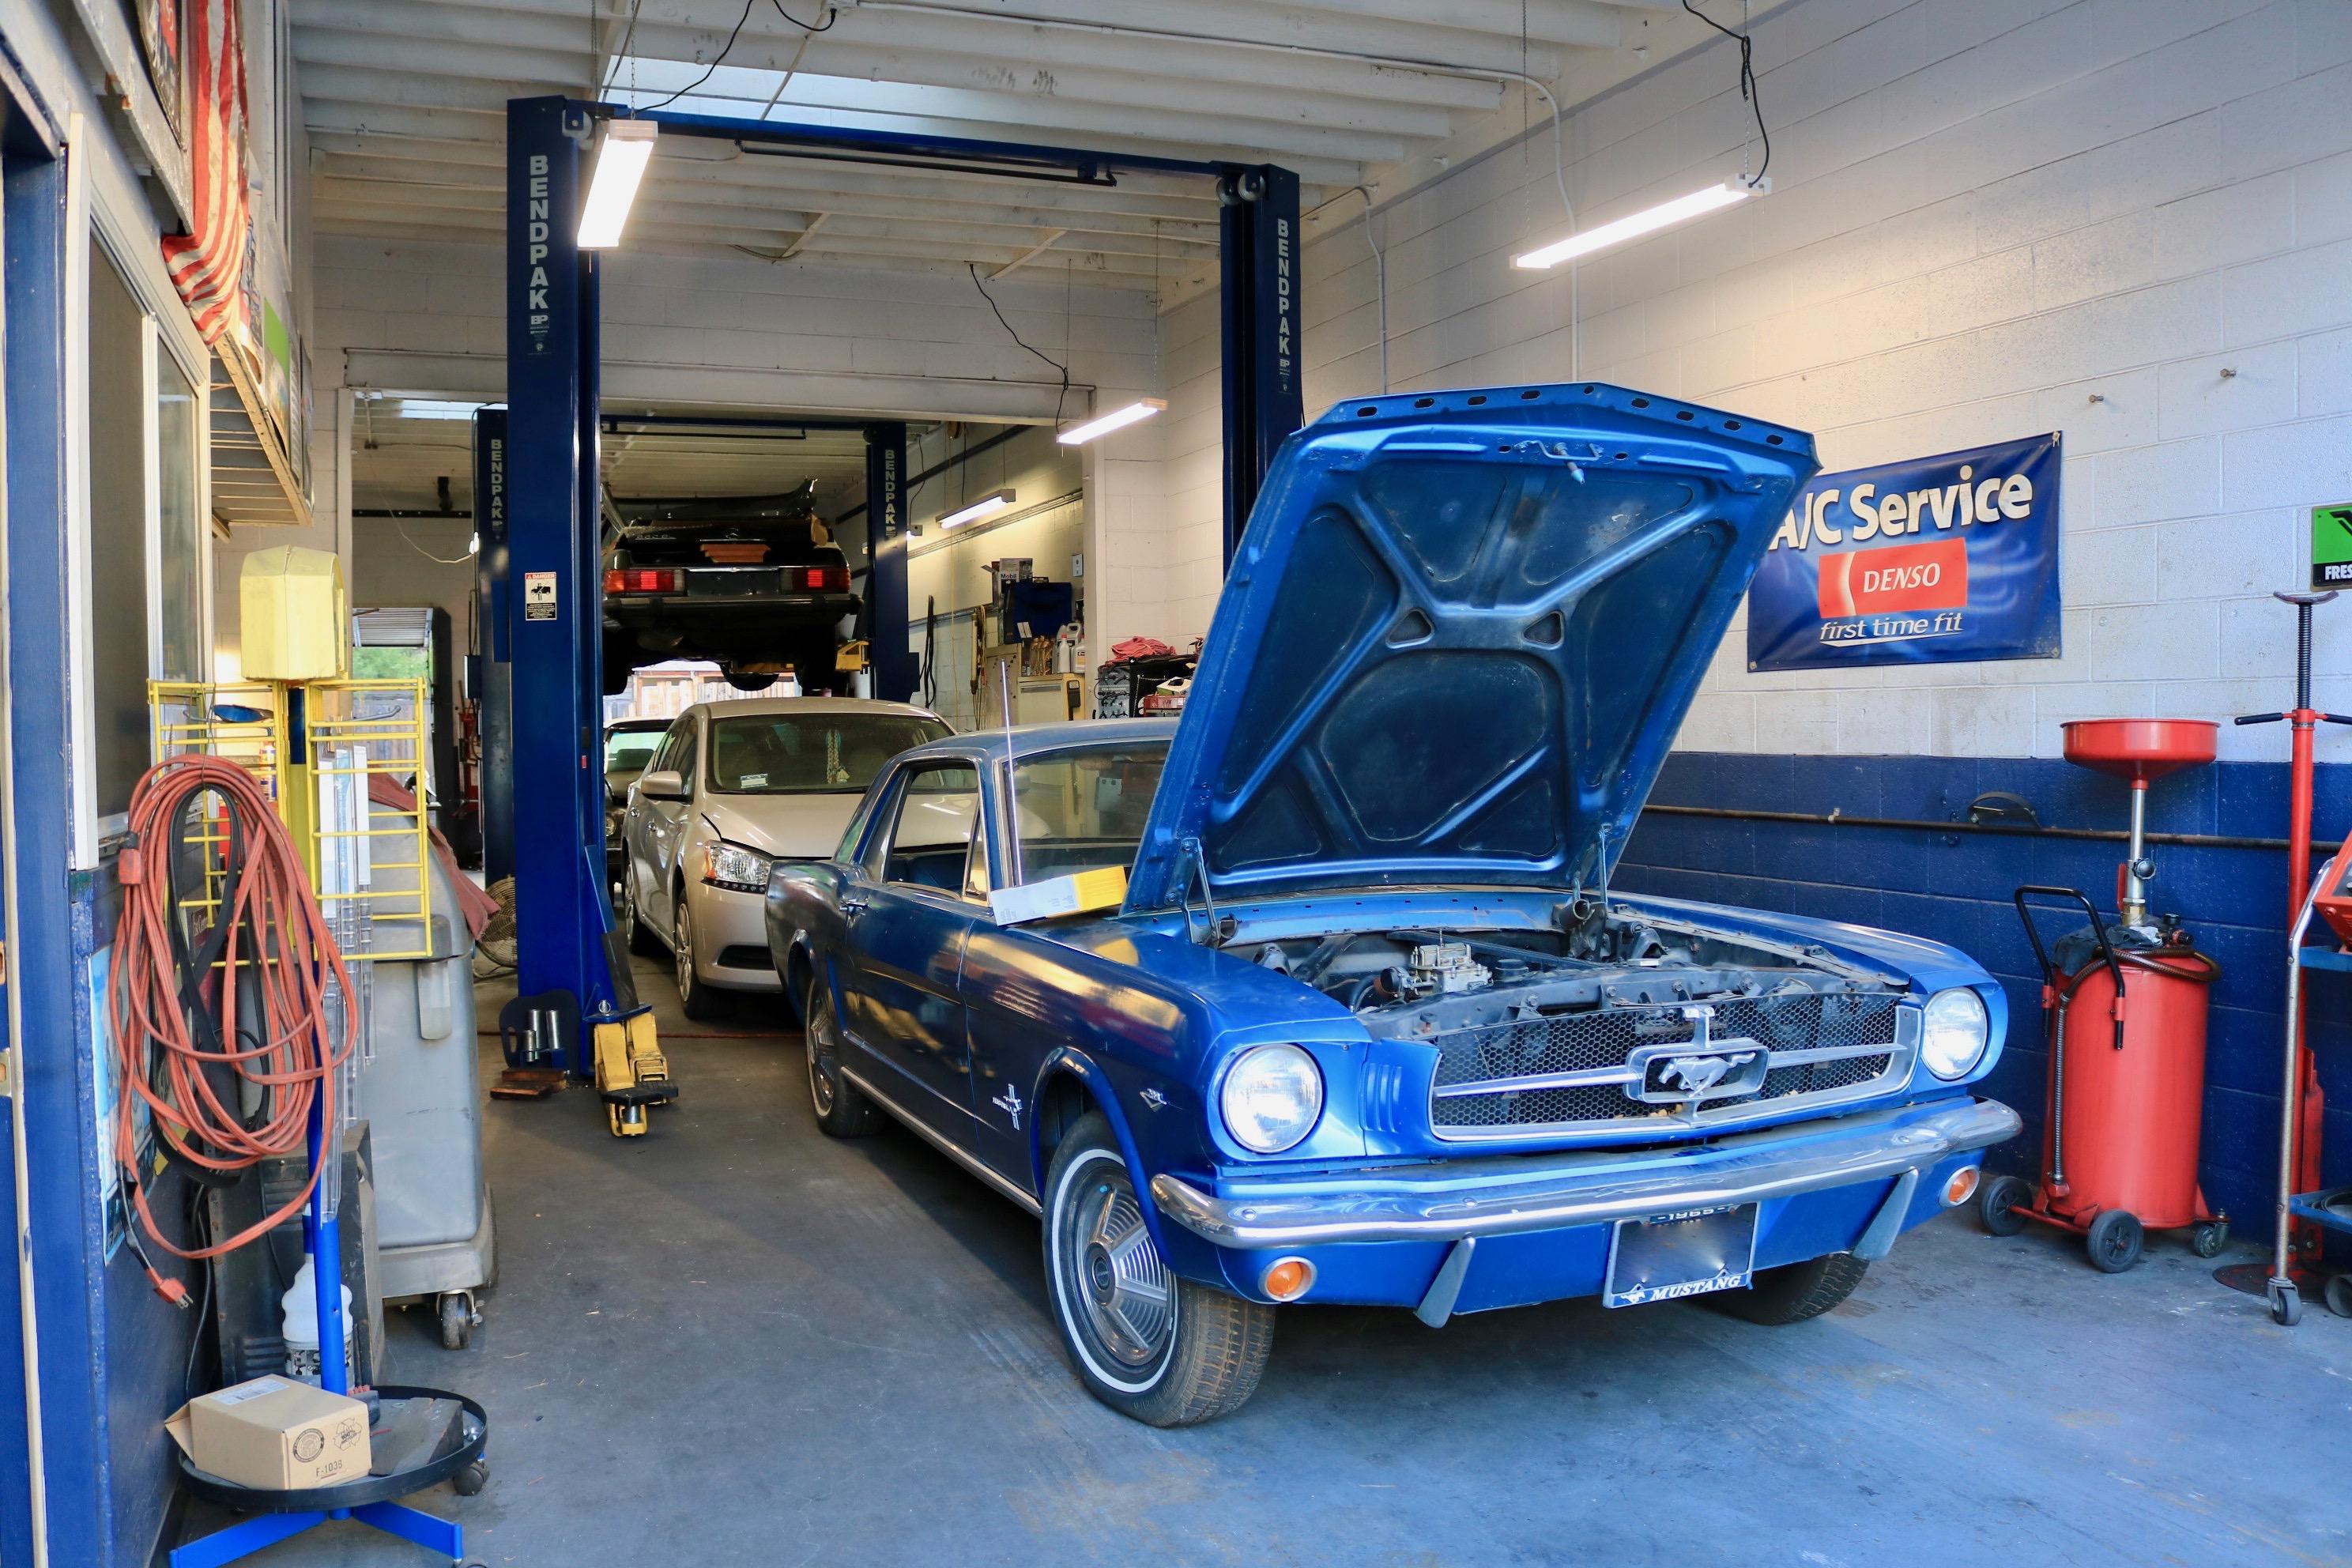 repair mechanic mechanical hoses all hitech bentley wheel water service drive repairs auto